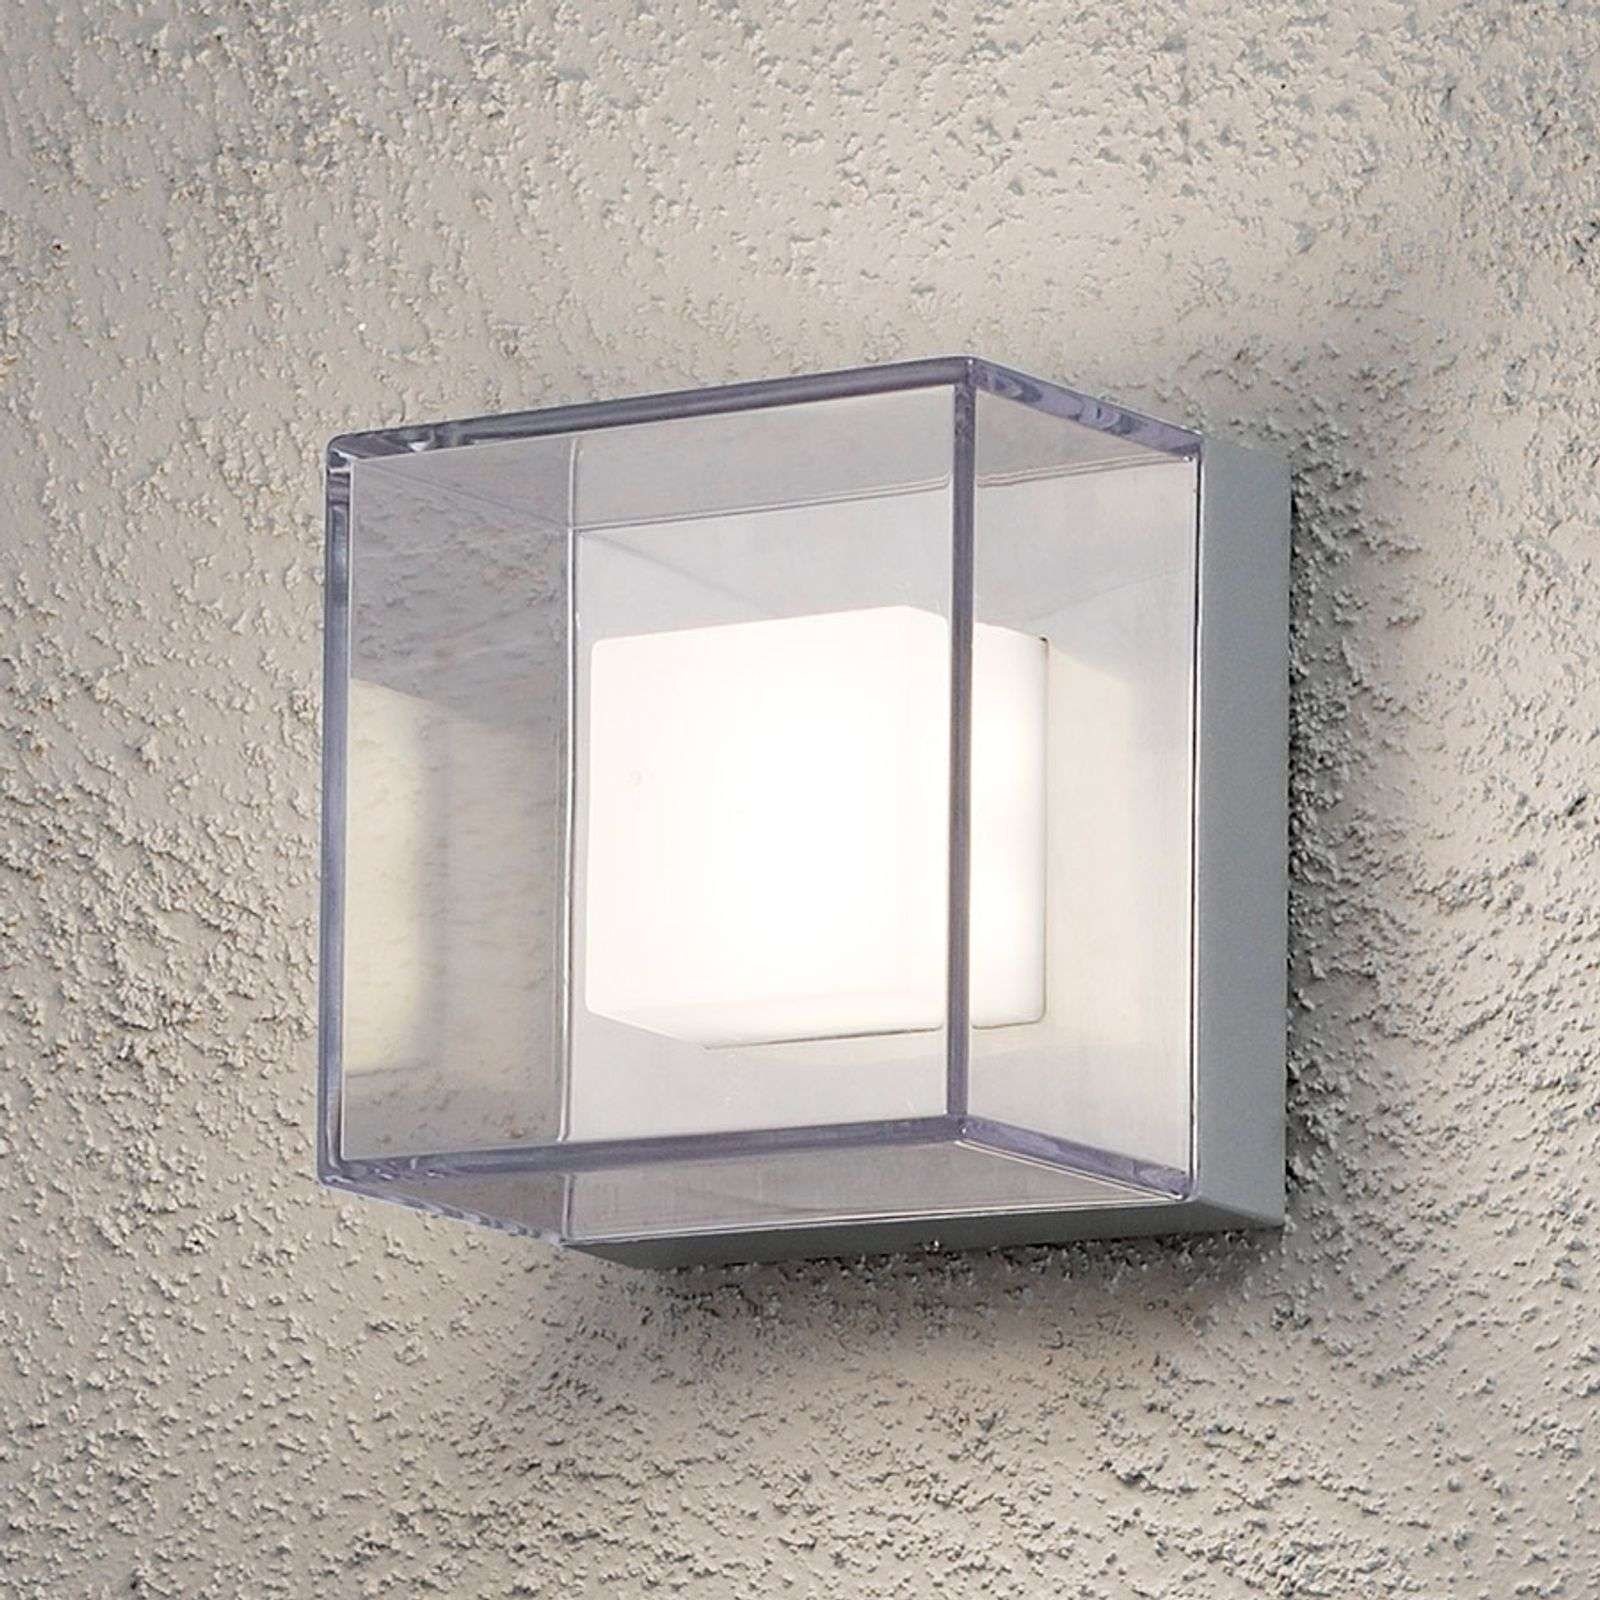 Buitenlamp Sensor Draadloos Rvs Buitenverlichting Led Lichtsensor Lamp Buiten Buitenverlichting Led Bewegingssensor Wandlamp Buiten Wandverlichting Led